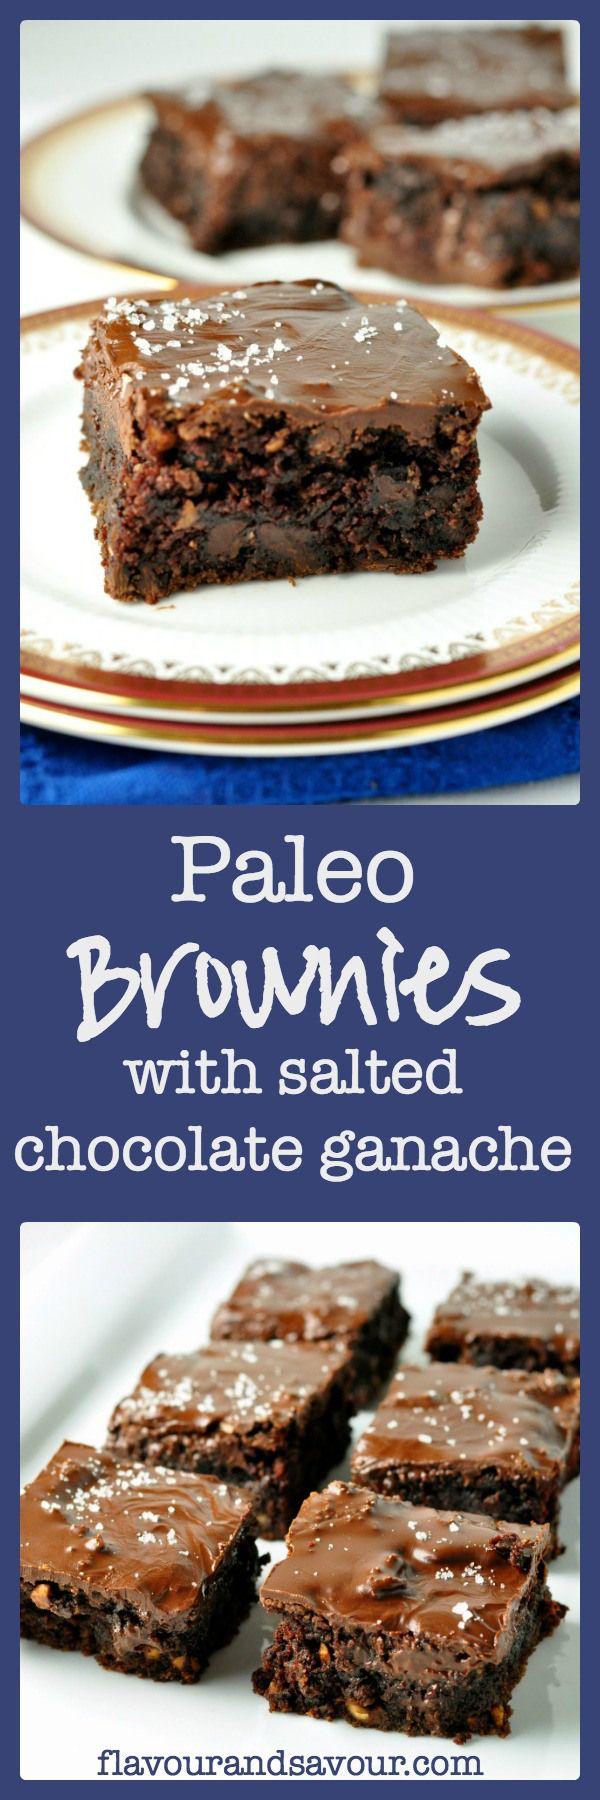 Paleo Brownies with Salted Chocolate Ganache. Oh my.  www.flavourandsavour.com